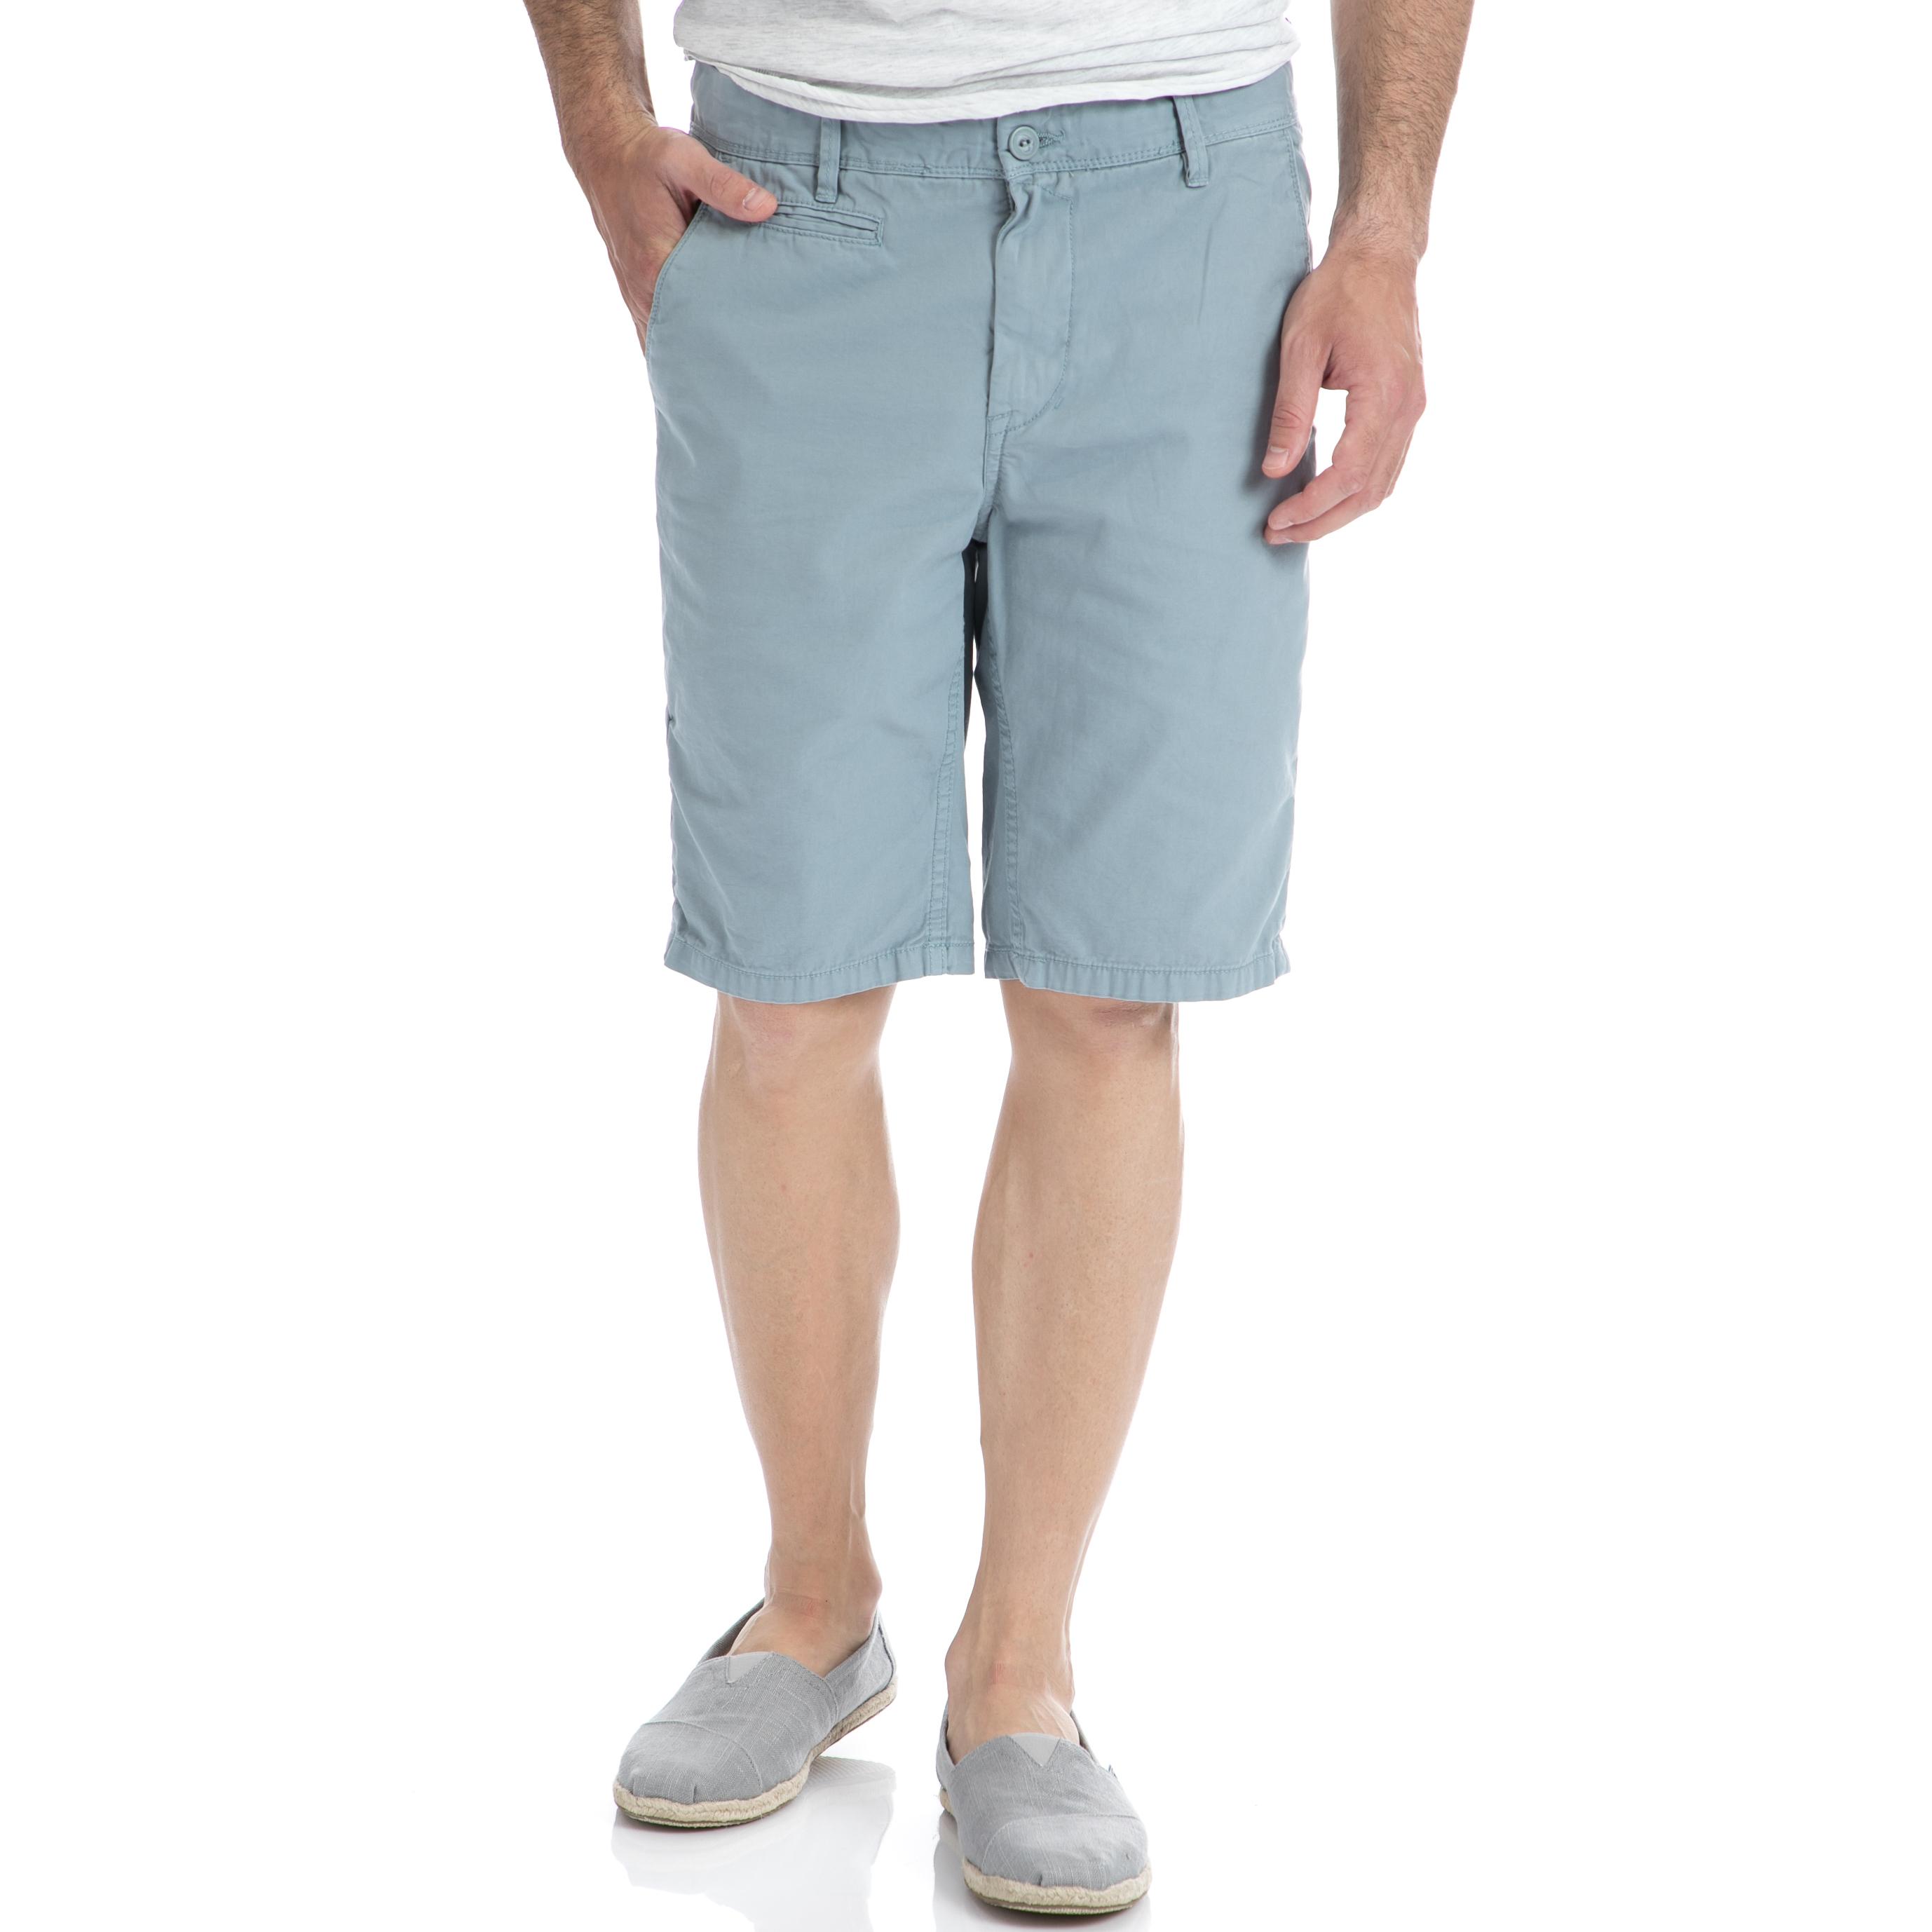 GARCIA JEANS - Αντρική βερμούδα Garcia Jeans μπλε ανδρικά ρούχα σορτς βερμούδες casual jean